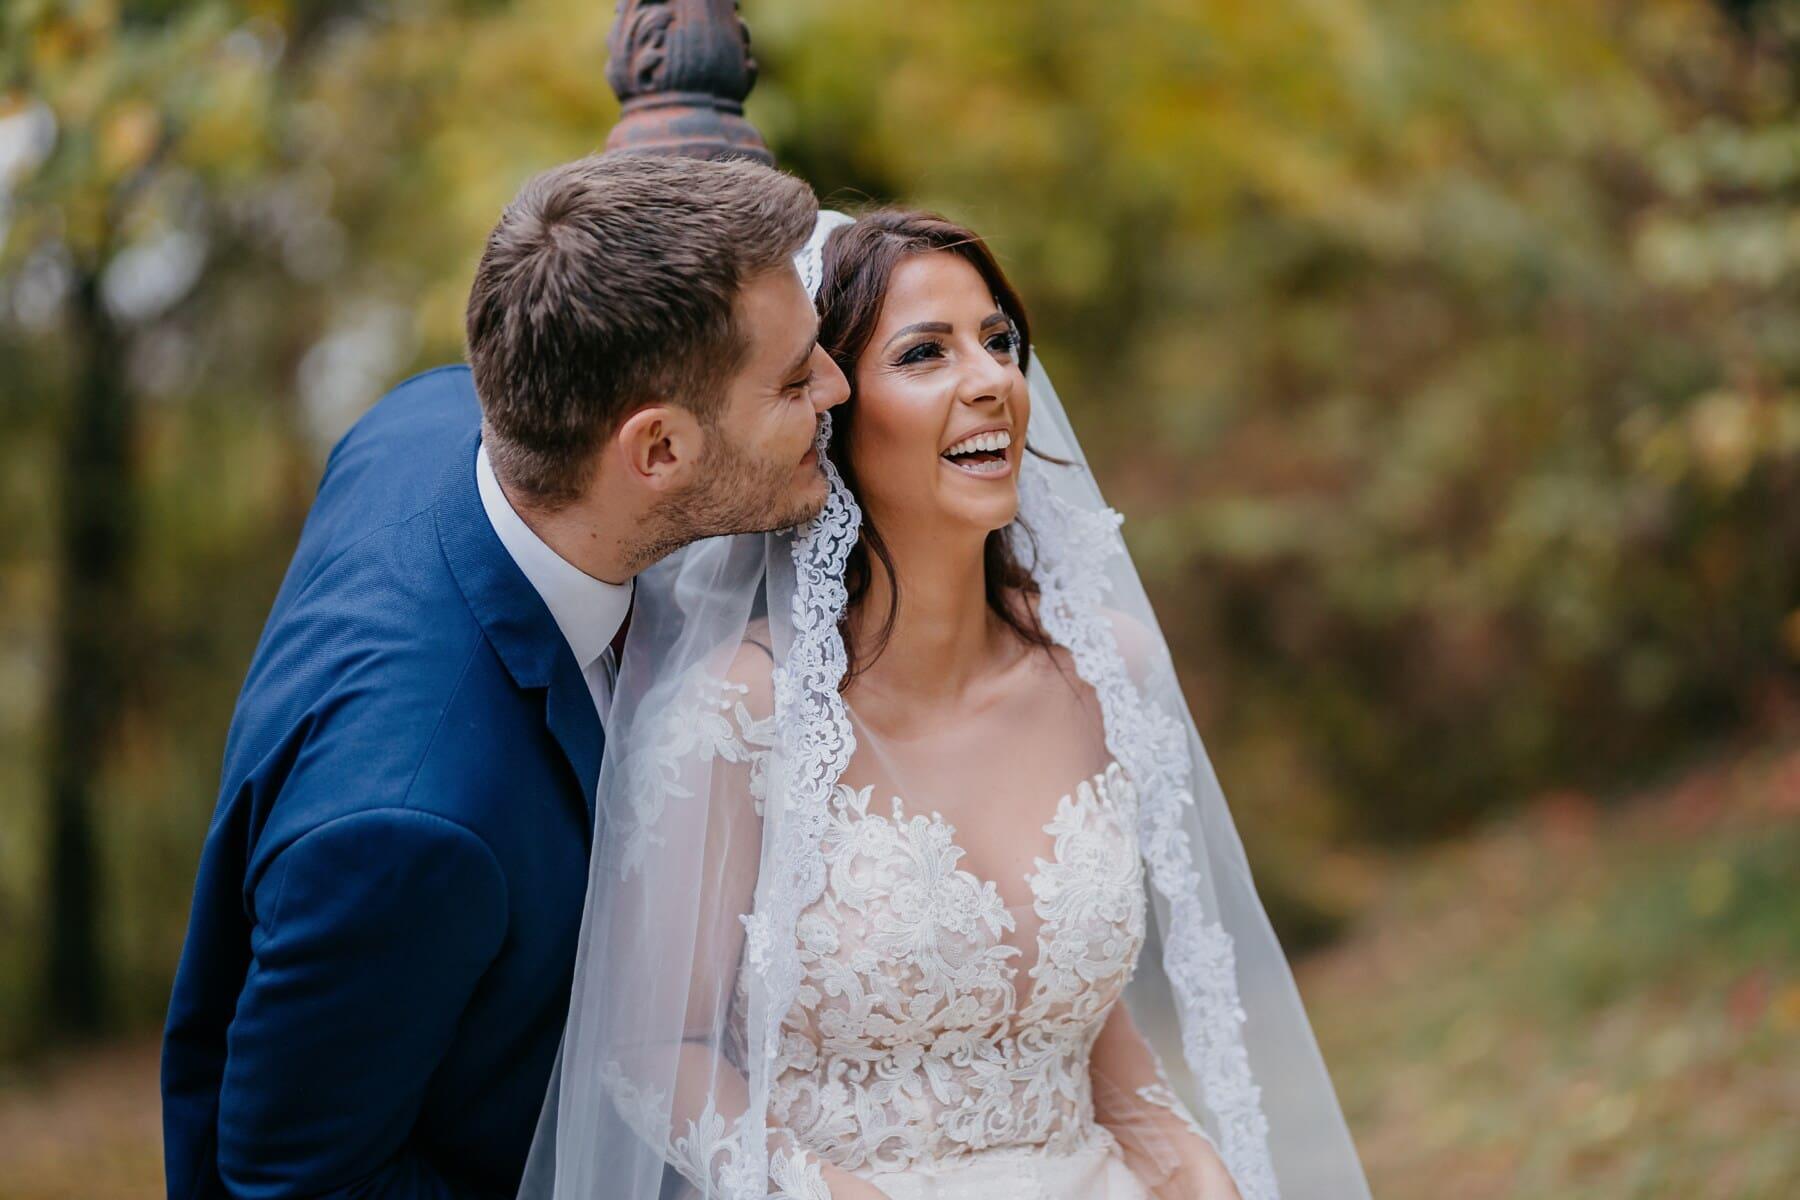 happiness, bride, laugh, joy, enjoyment, gentleman, lady, smile, newlyweds, couple